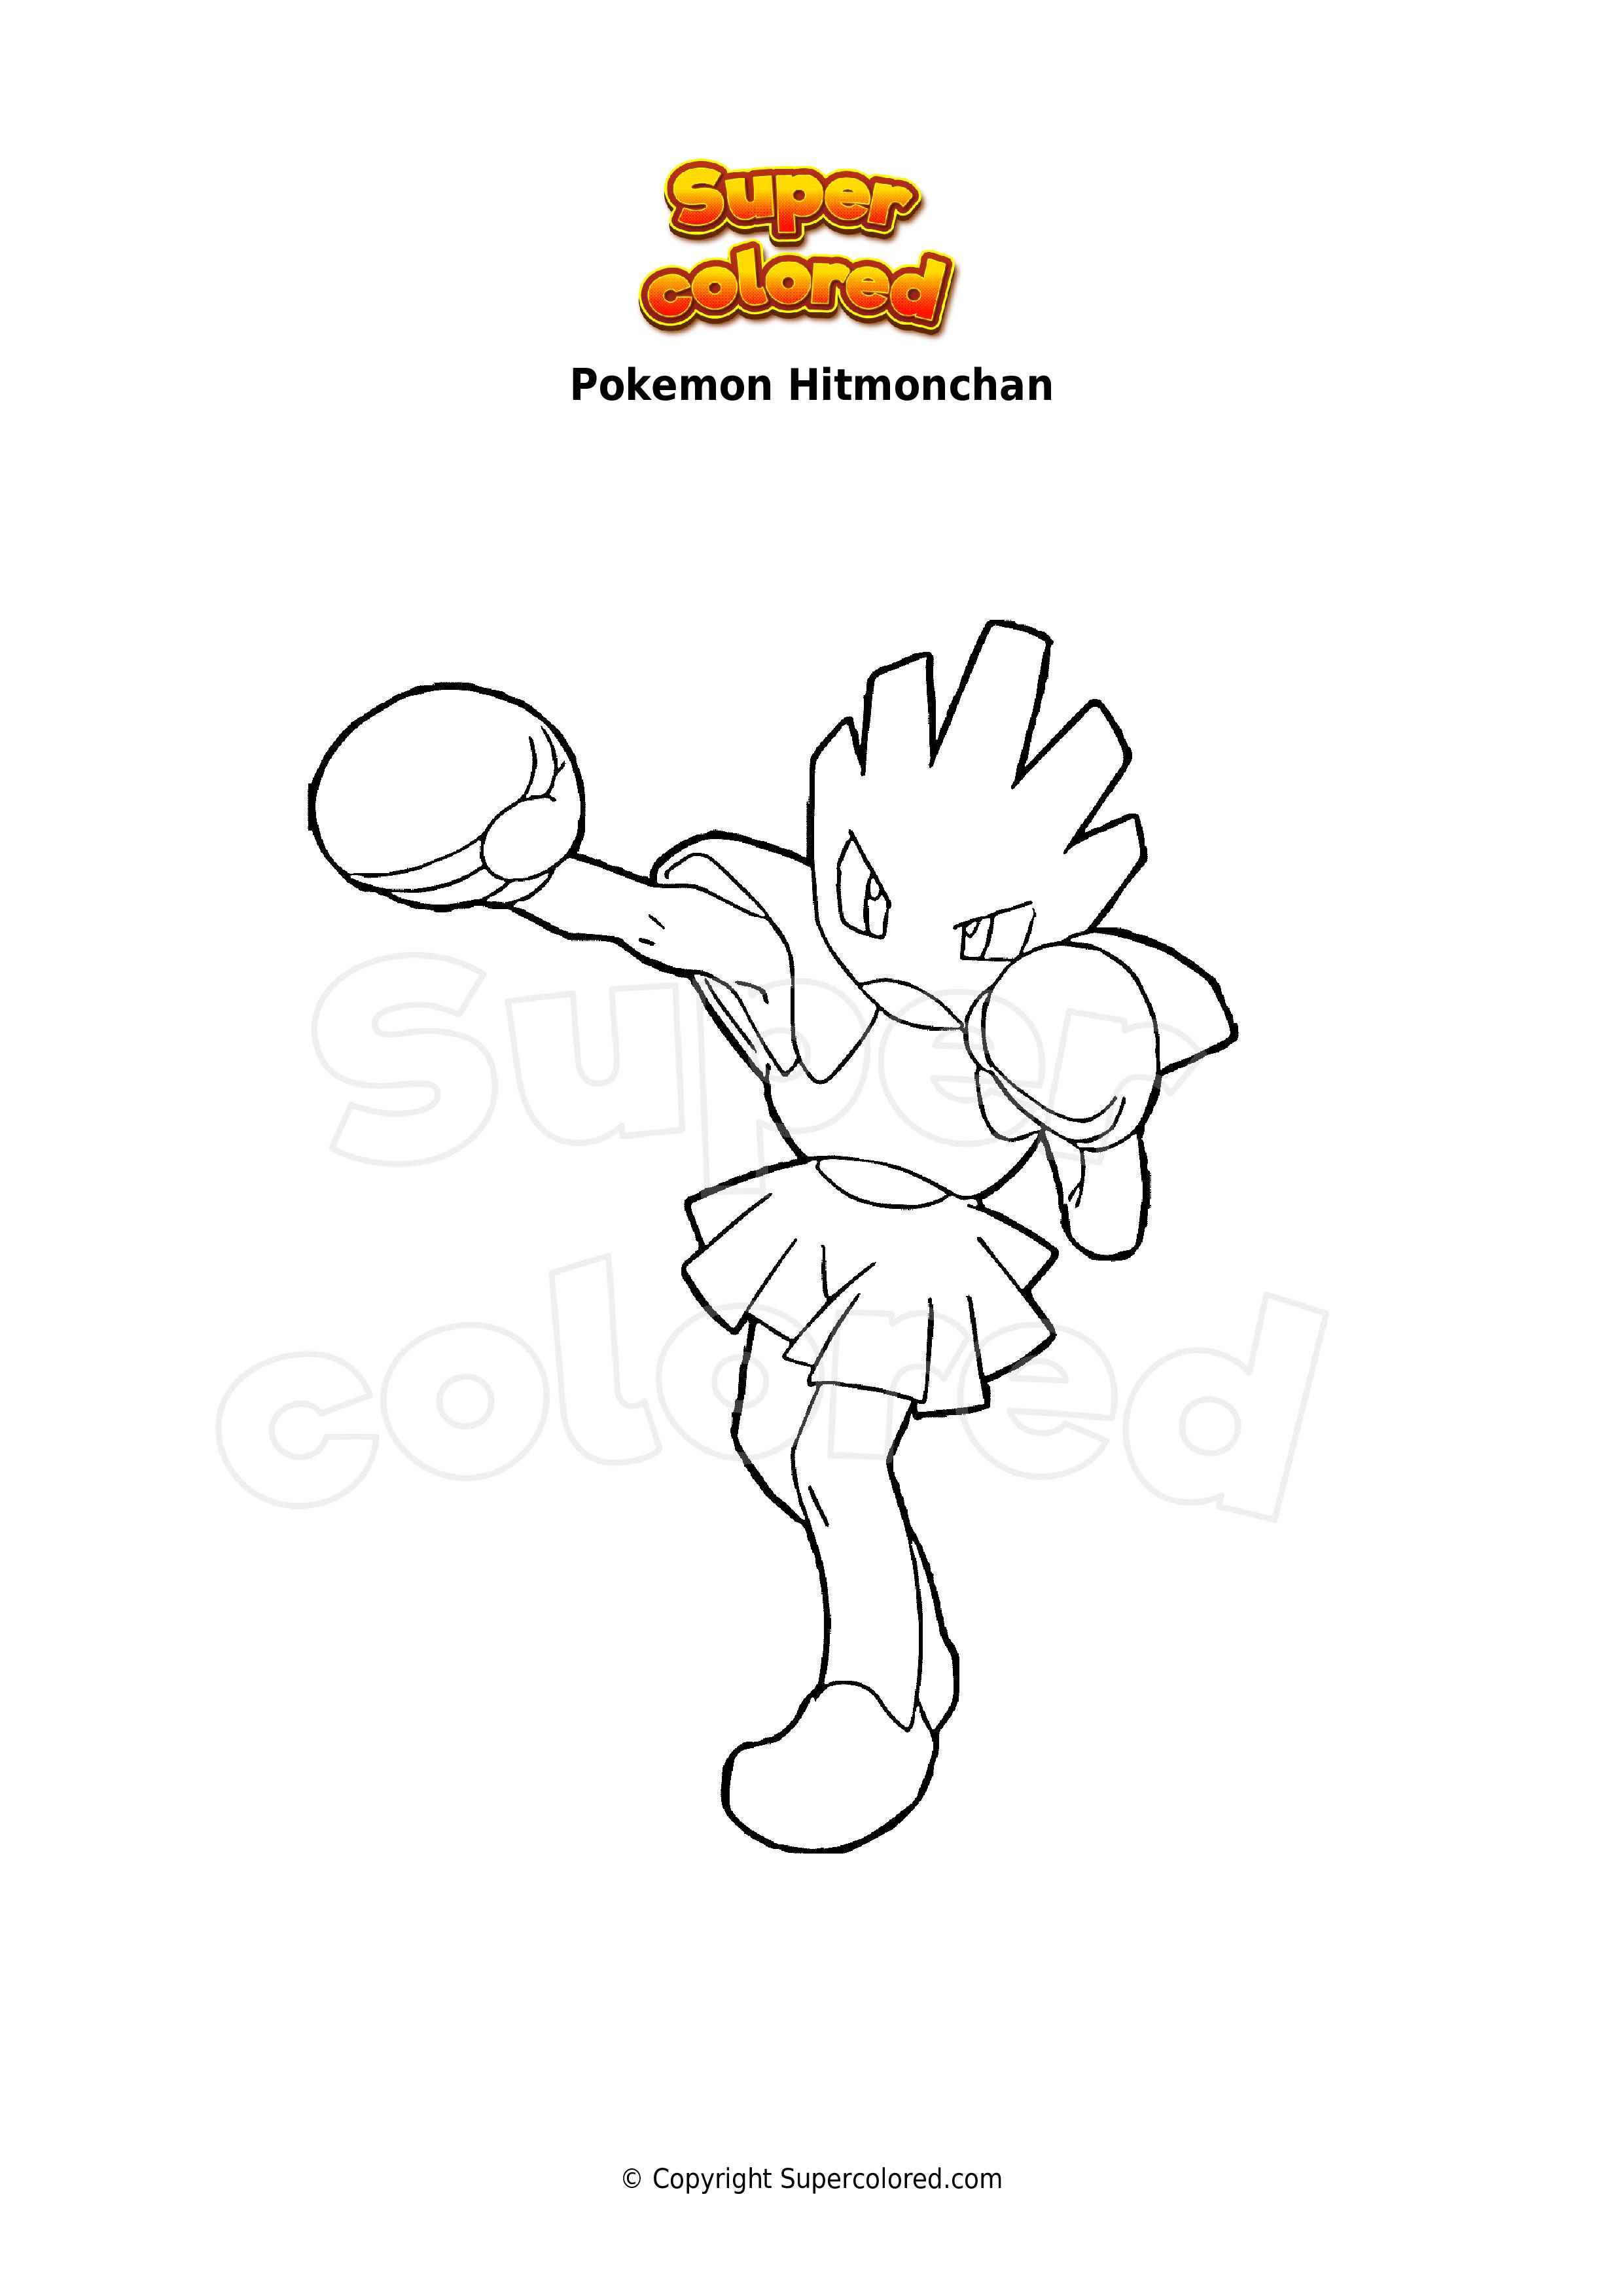 Coloring Page Pokemon Hitmonchan Supercolored Com